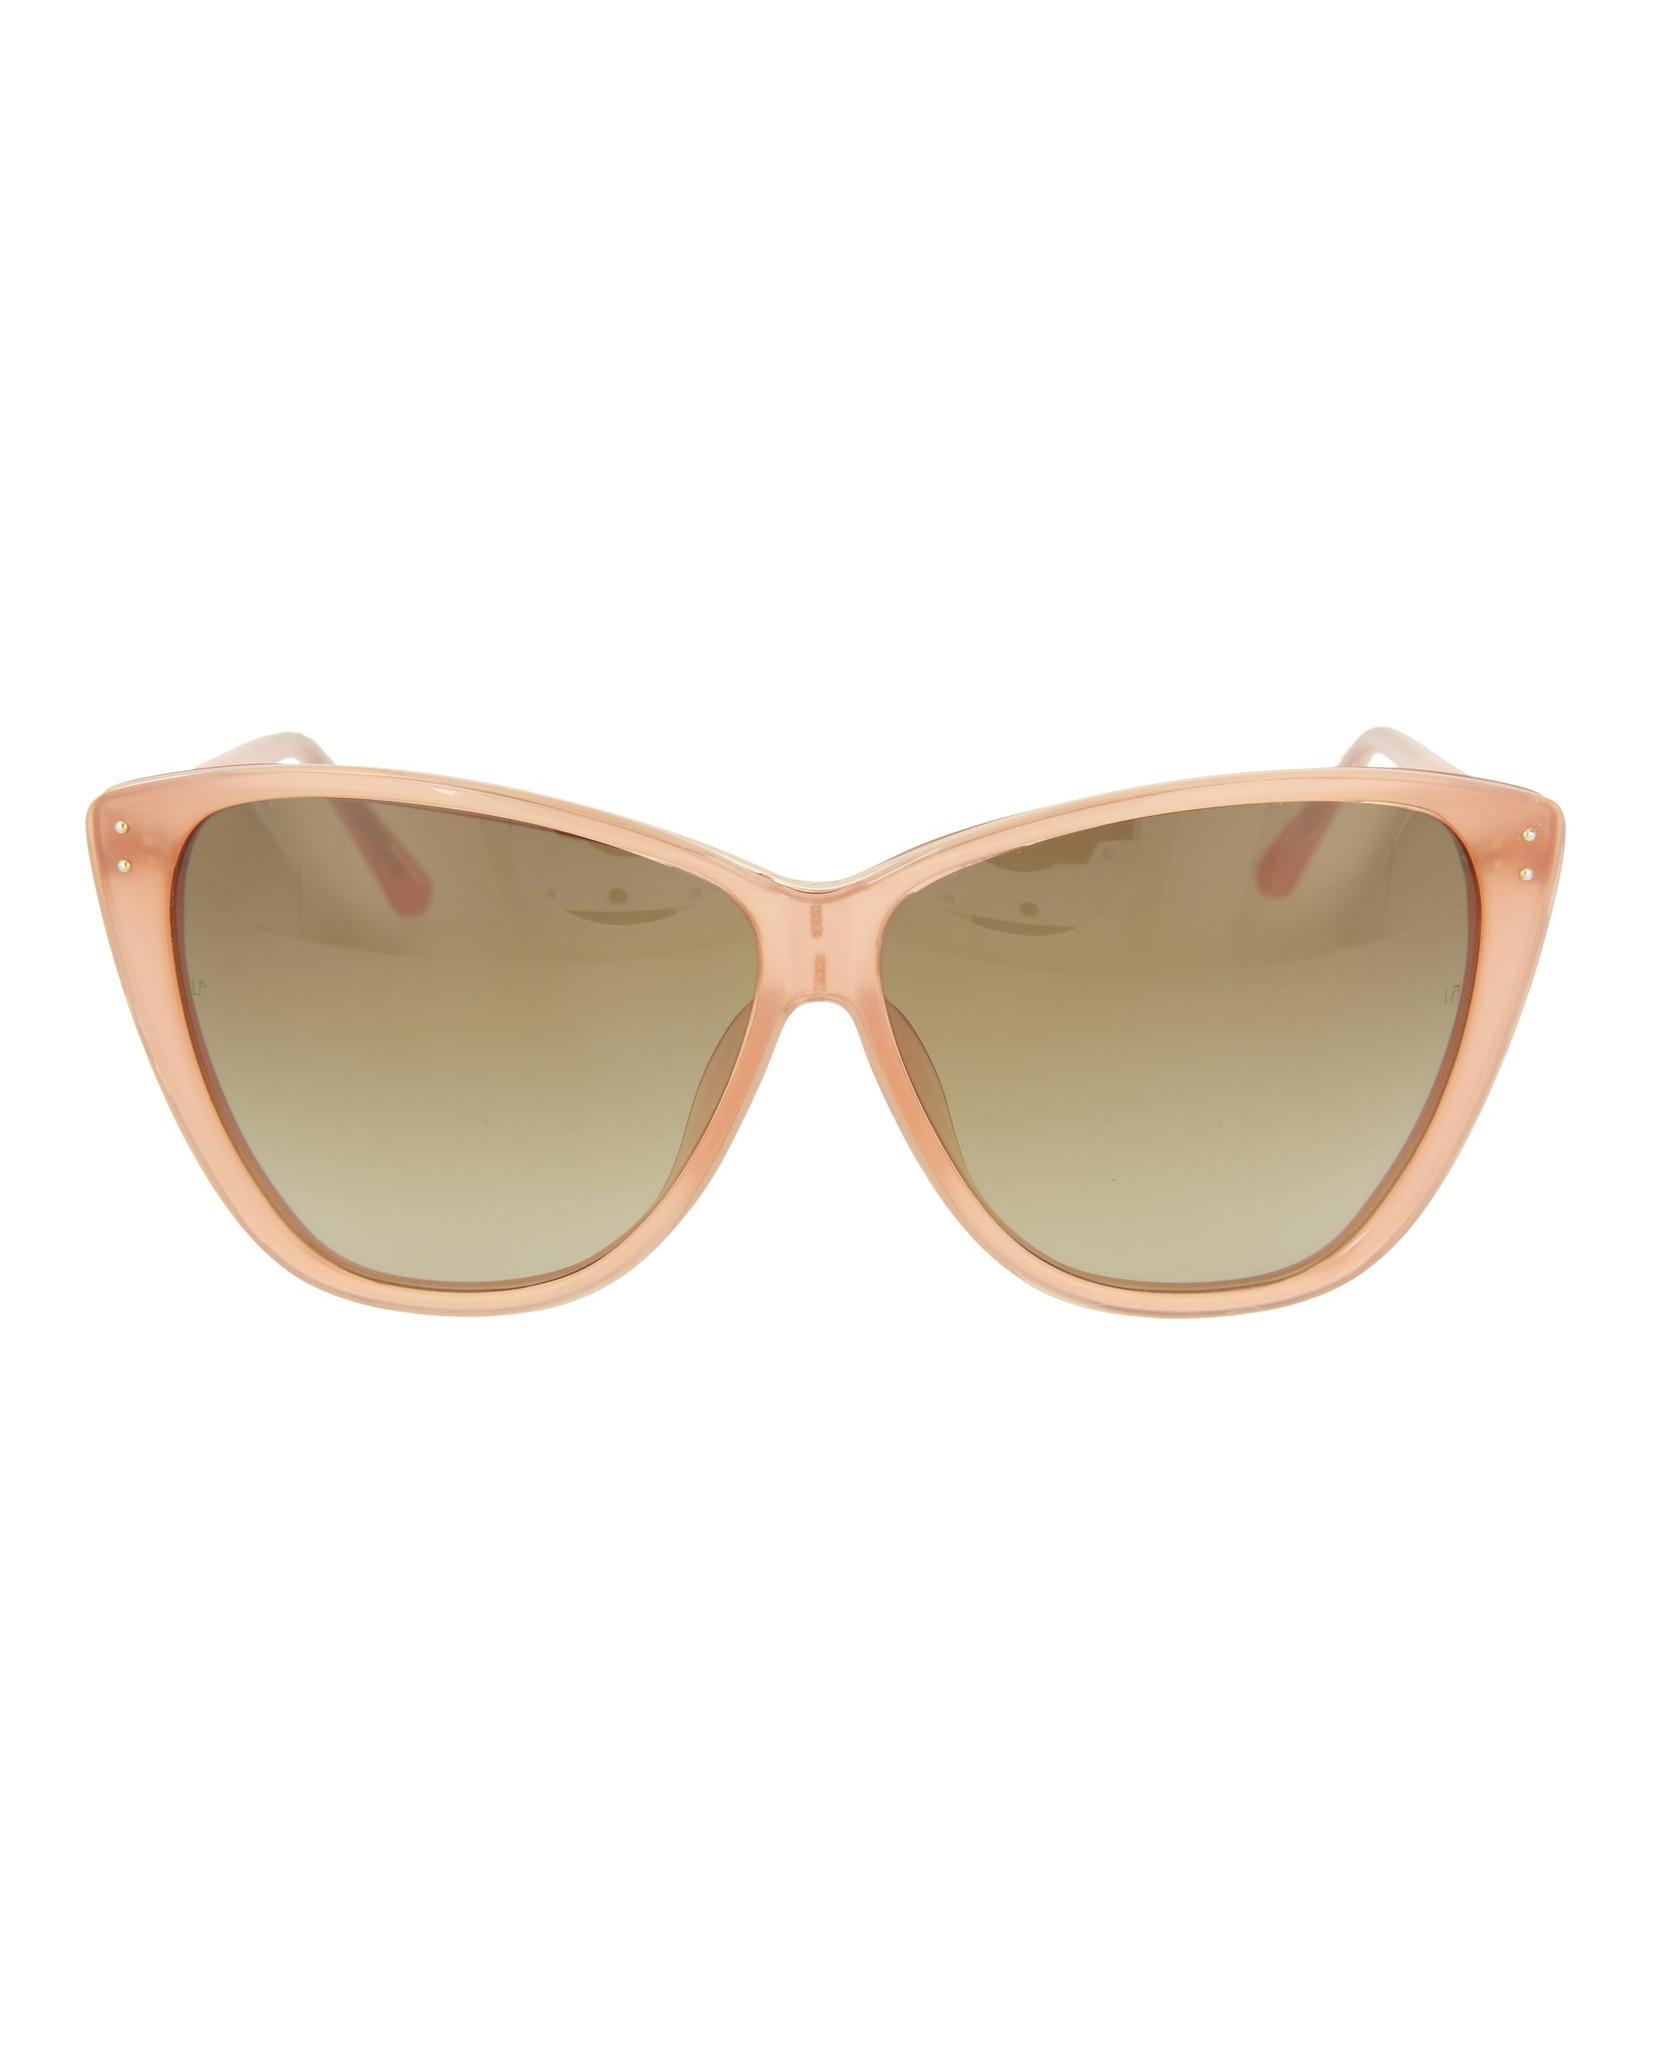 5b4aecb50955 Linda Farrow Womens Square Rectangle Sunglasses LFL153C8-SUN ...